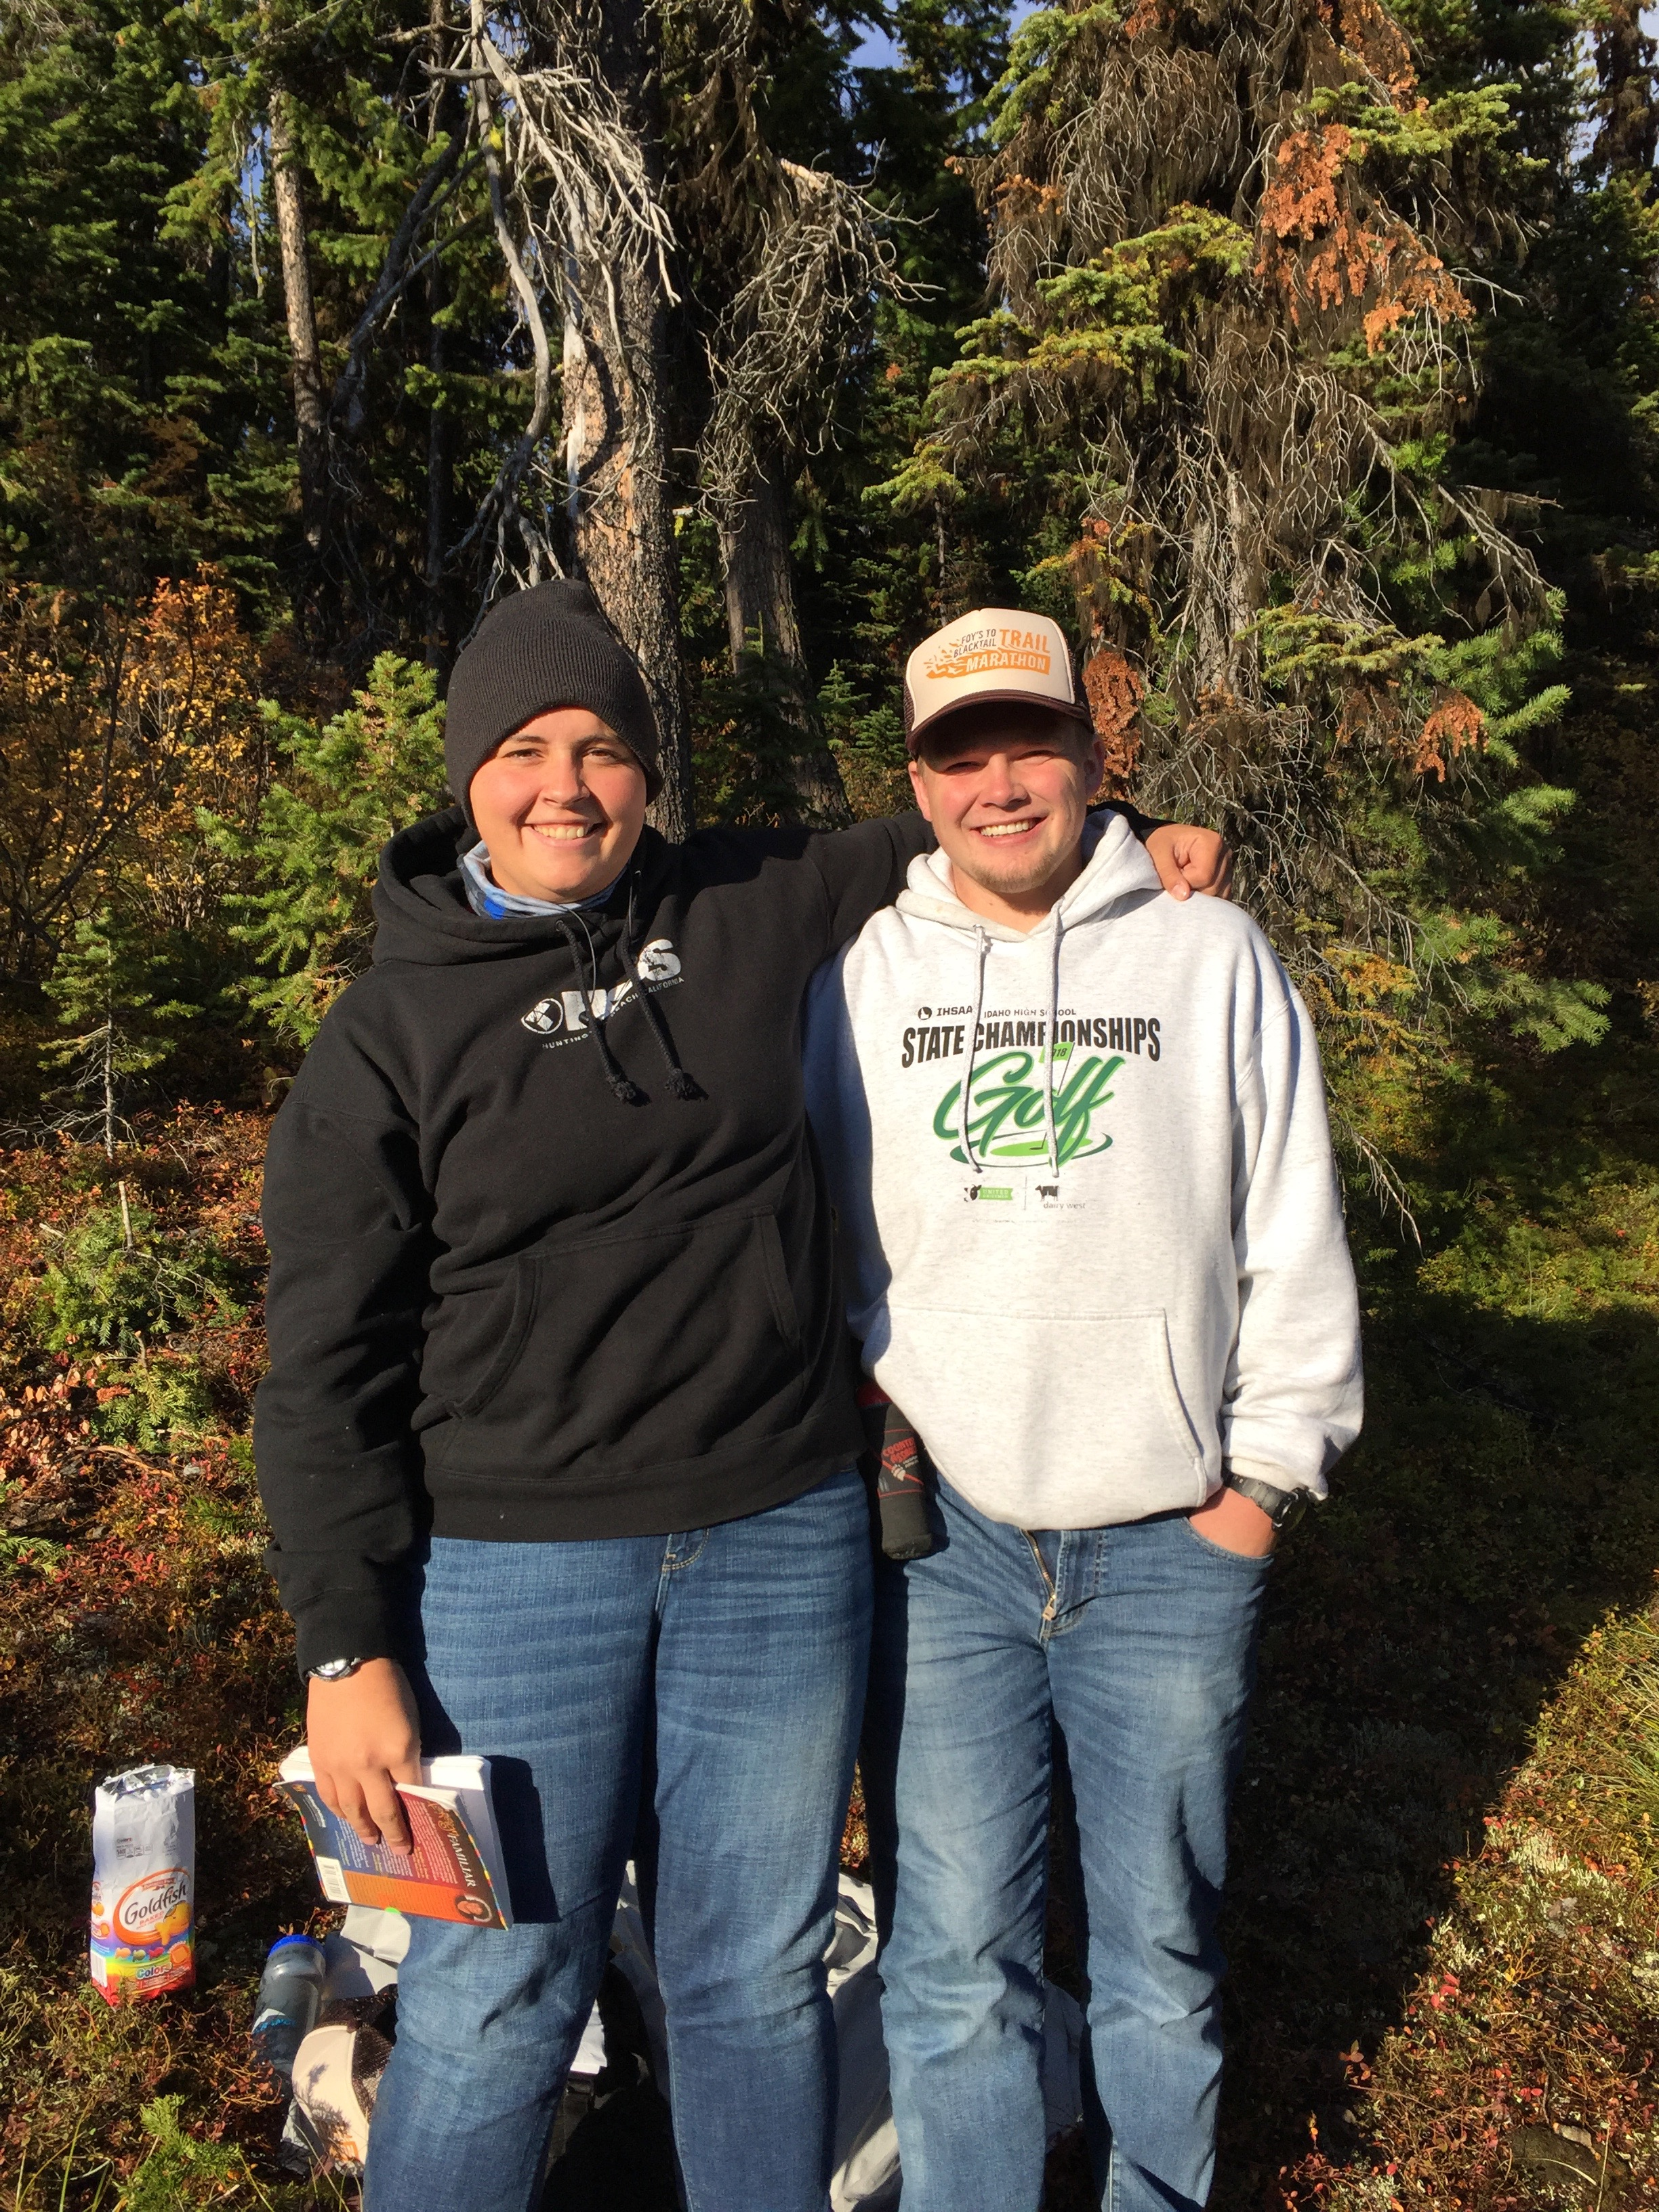 foys to blacktail trails trail marathon ftbtIMG_1054.JPG